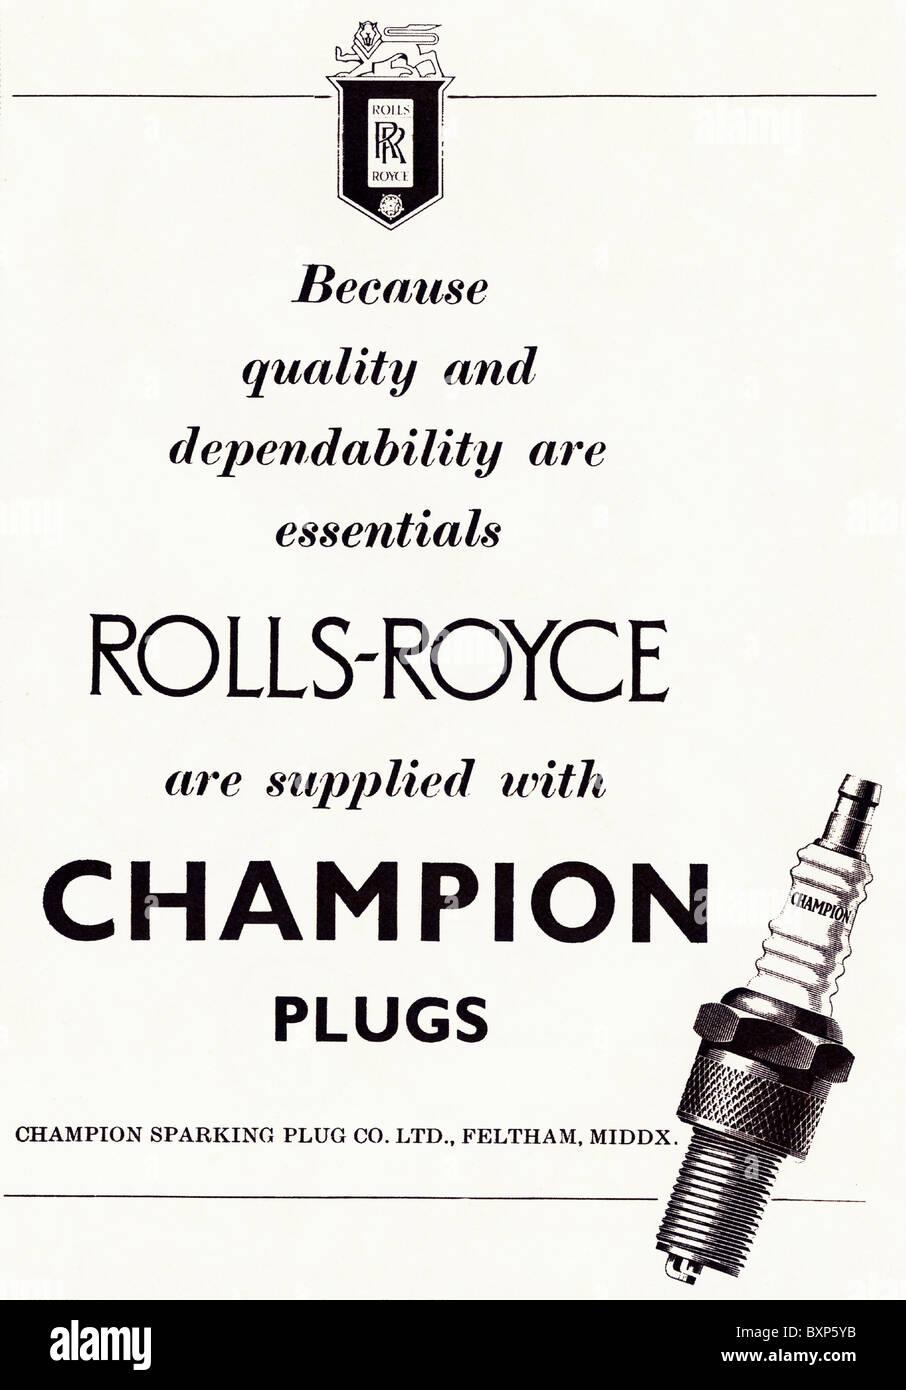 Magazine advertisement used circa 1953 for Champion Sparking Plug Co Ltd - Stock Image